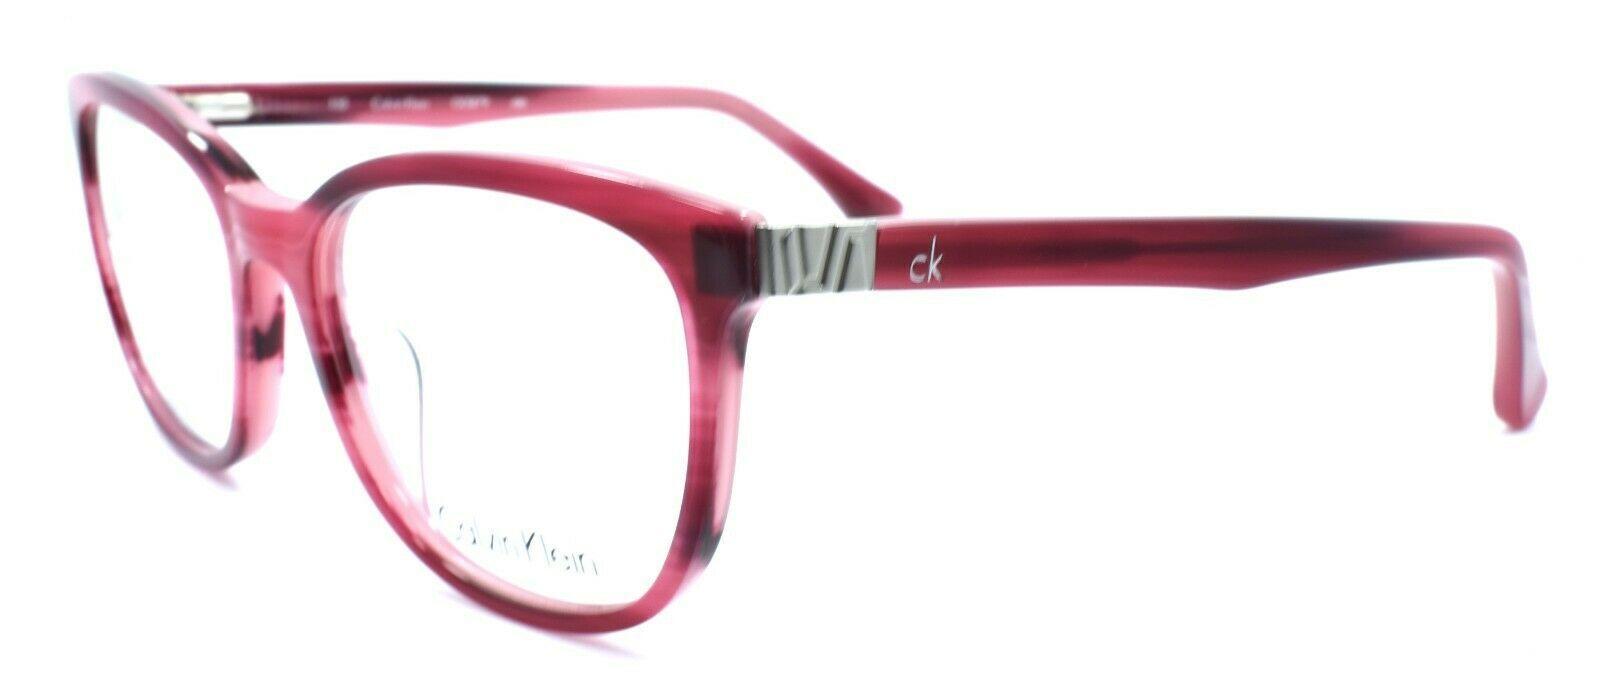 Calvin Klein CK5879 480 Women's Eyeglasses Frames 52-17-135 Striped Violet - $58.96